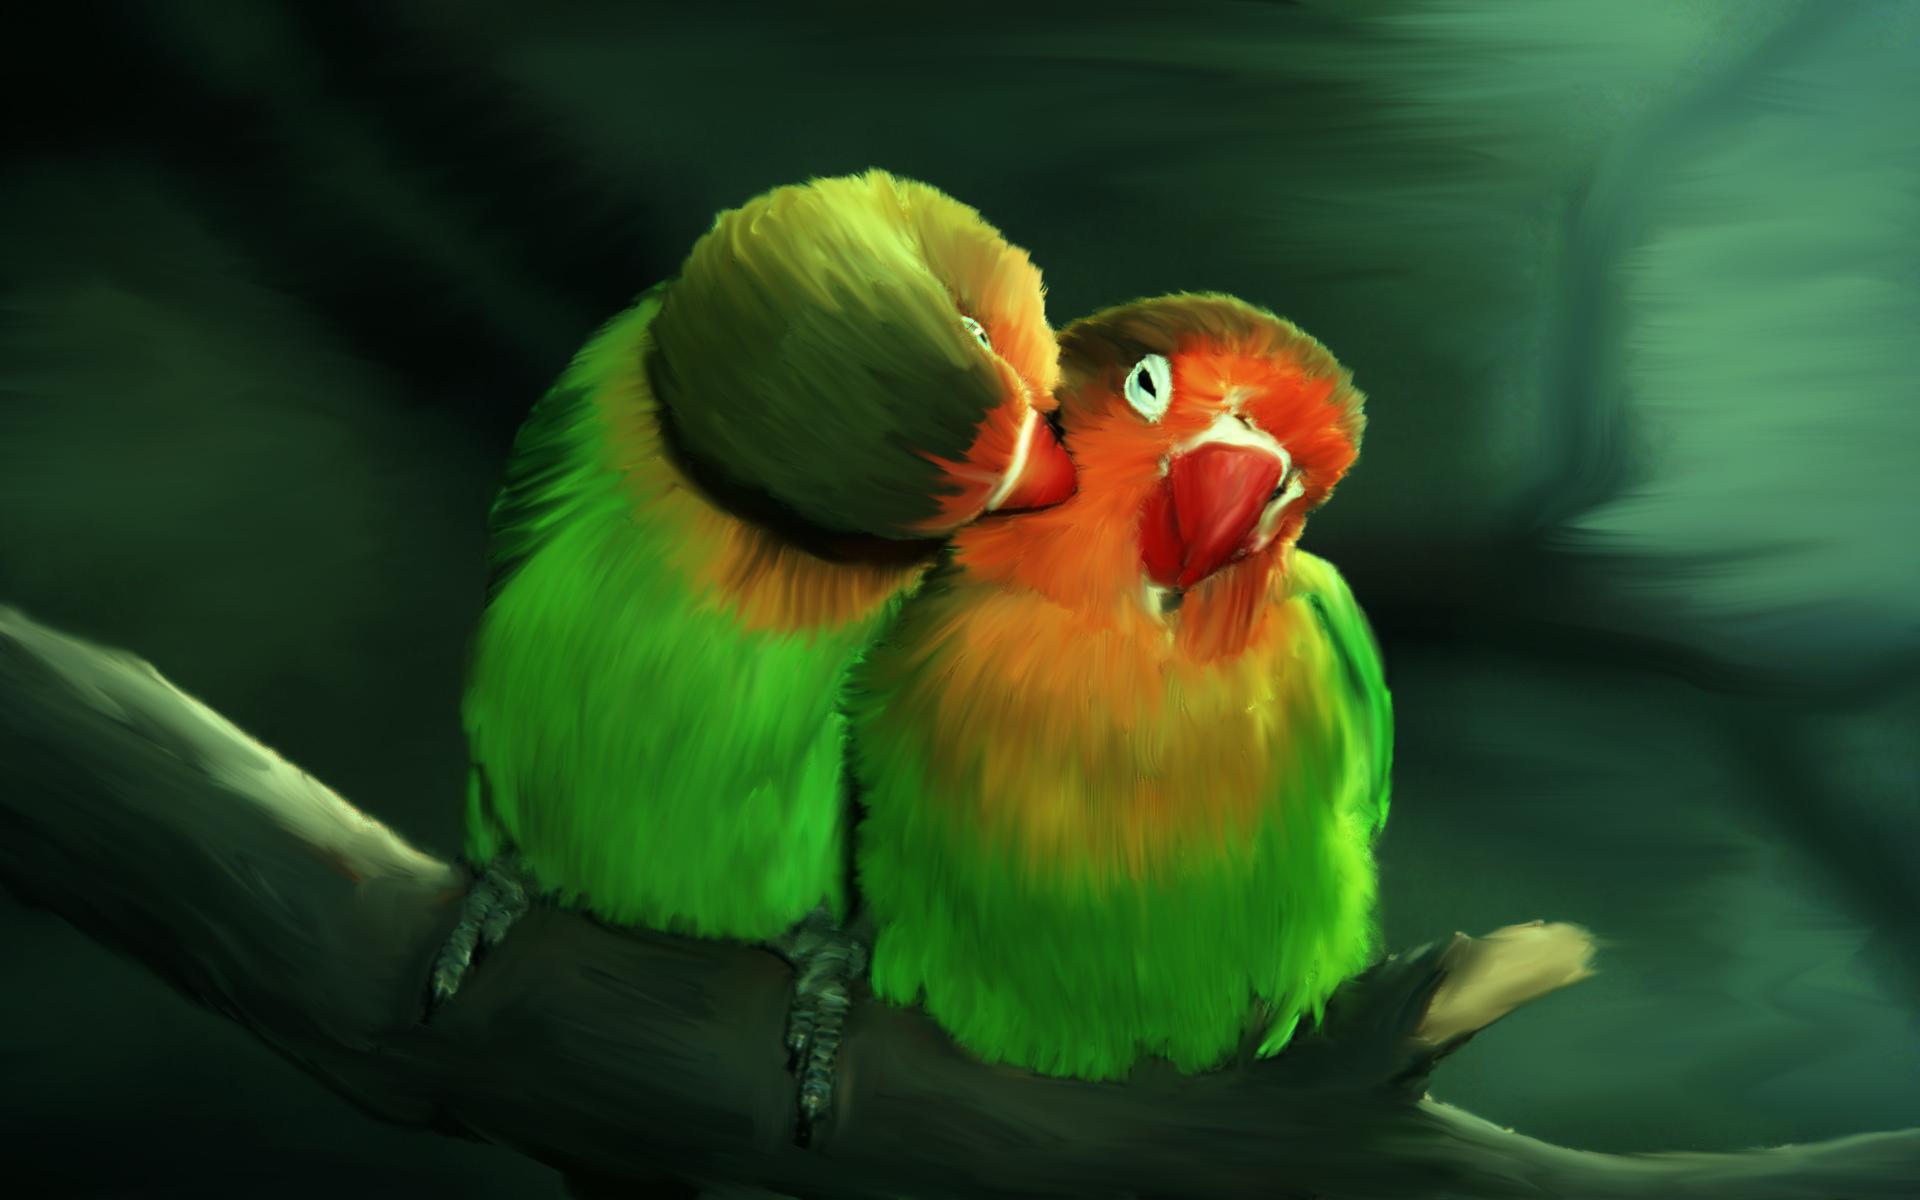 Wallpaper Love Pottery Hd Images : Wallpaper Of Love Birds - WallpaperSafari